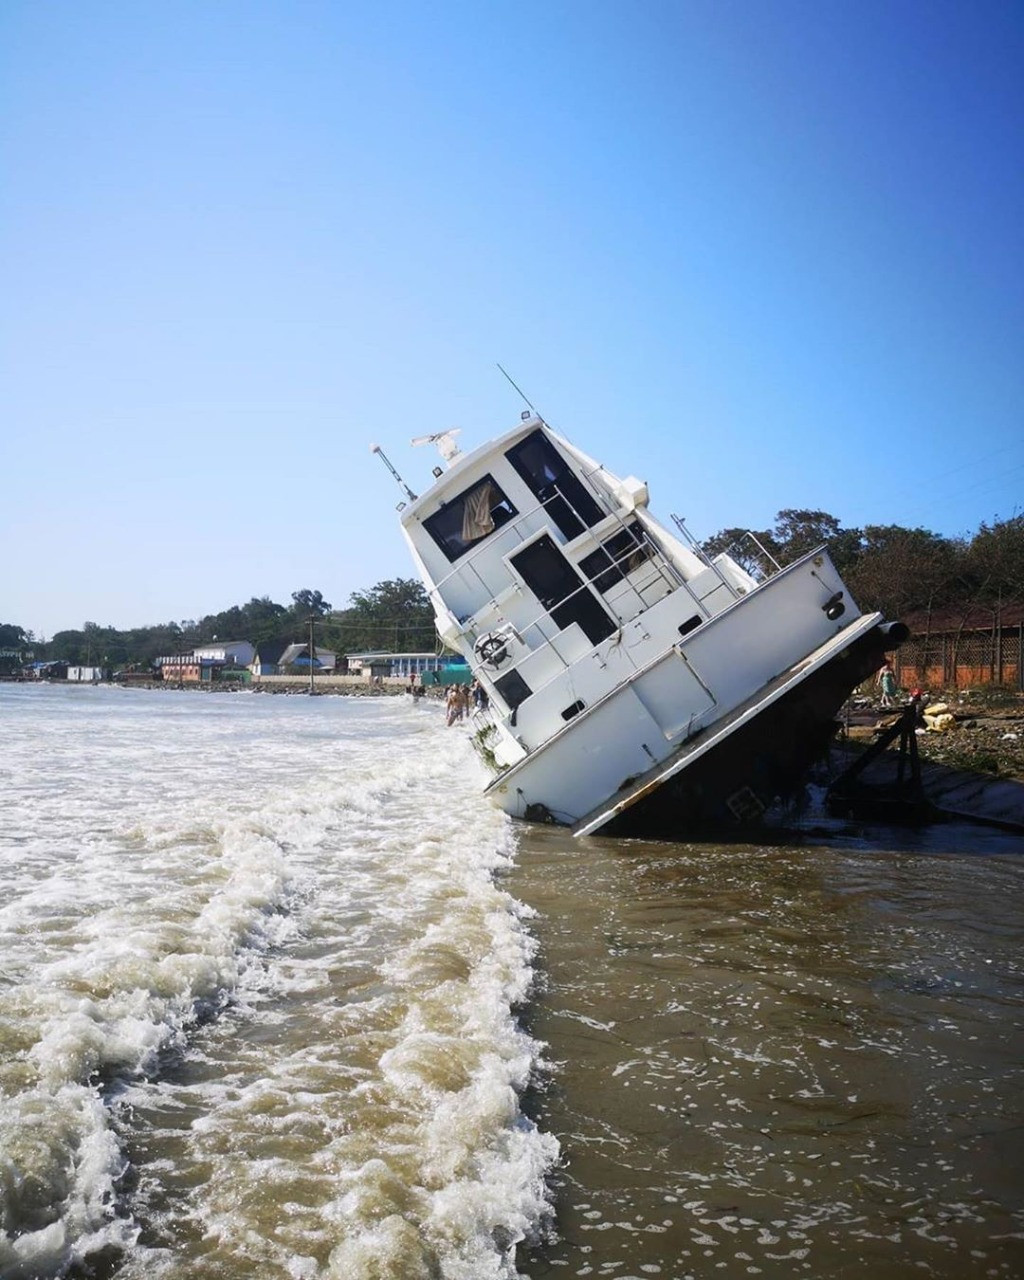 Последствия супертайфуна «Майсак» устраняют во Владивостоке